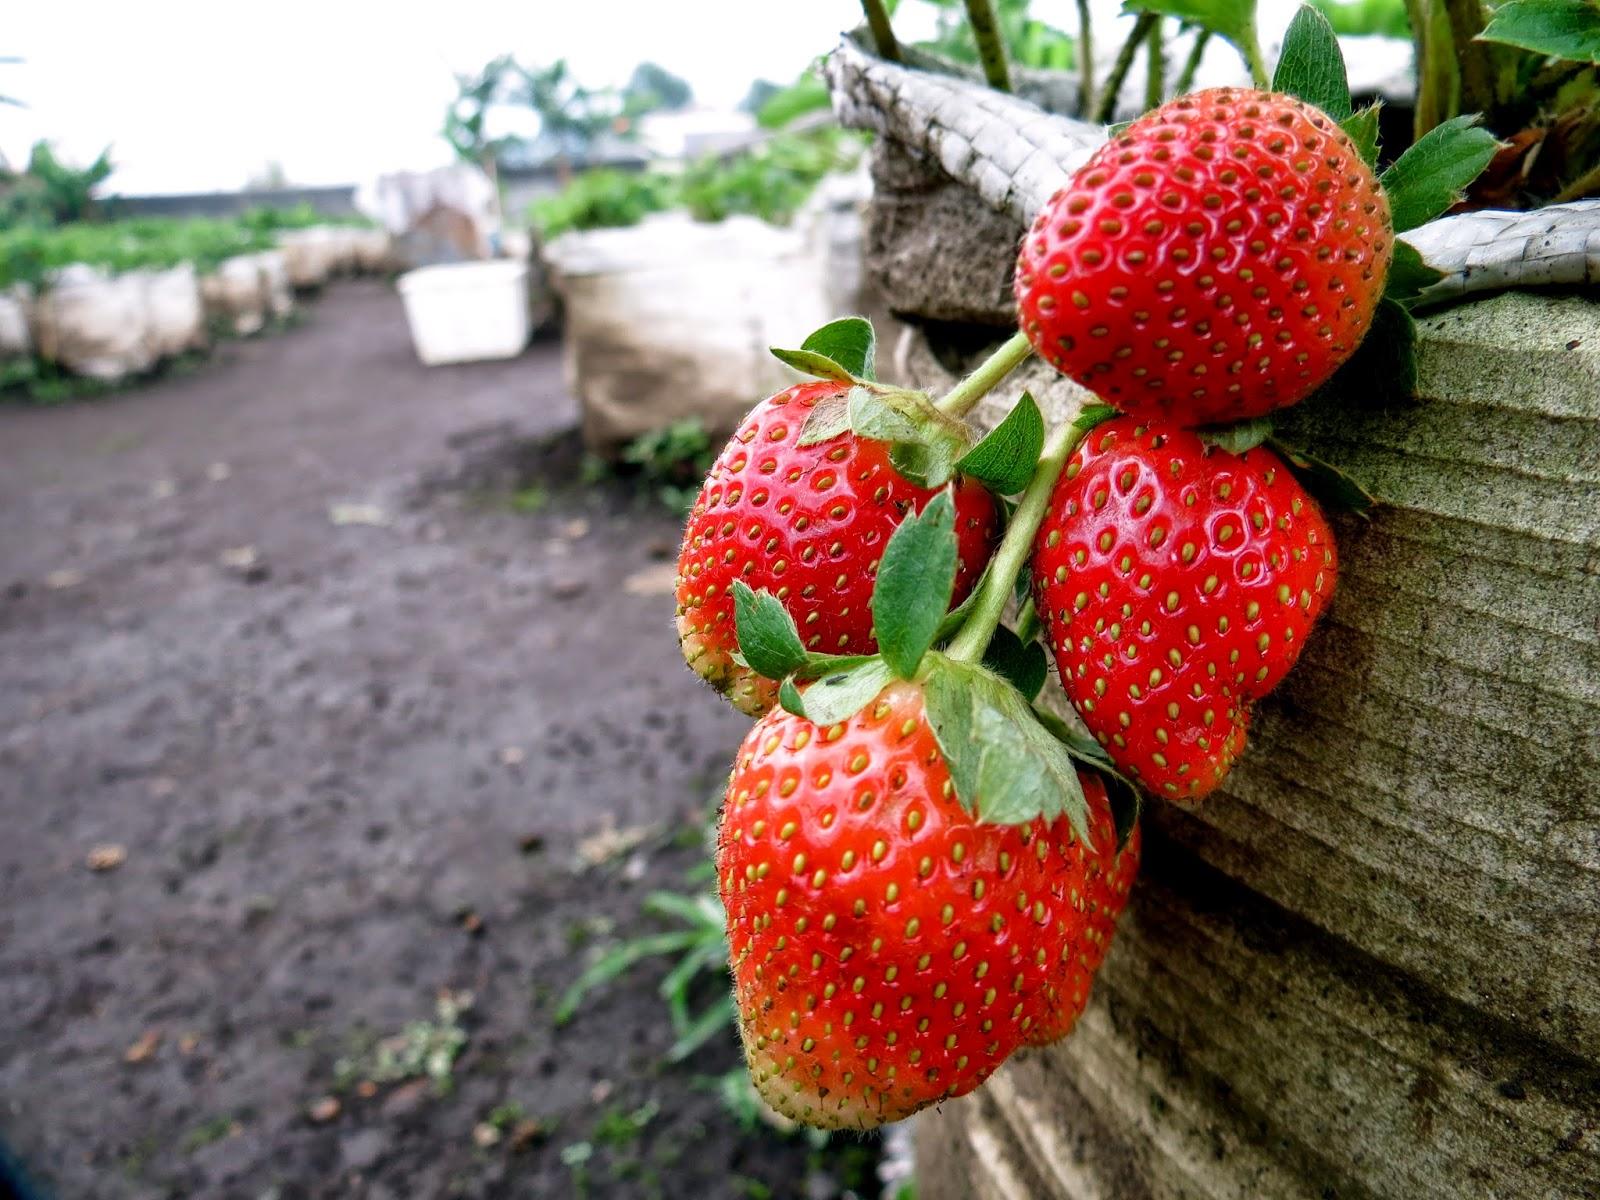 bandung strawberry farm